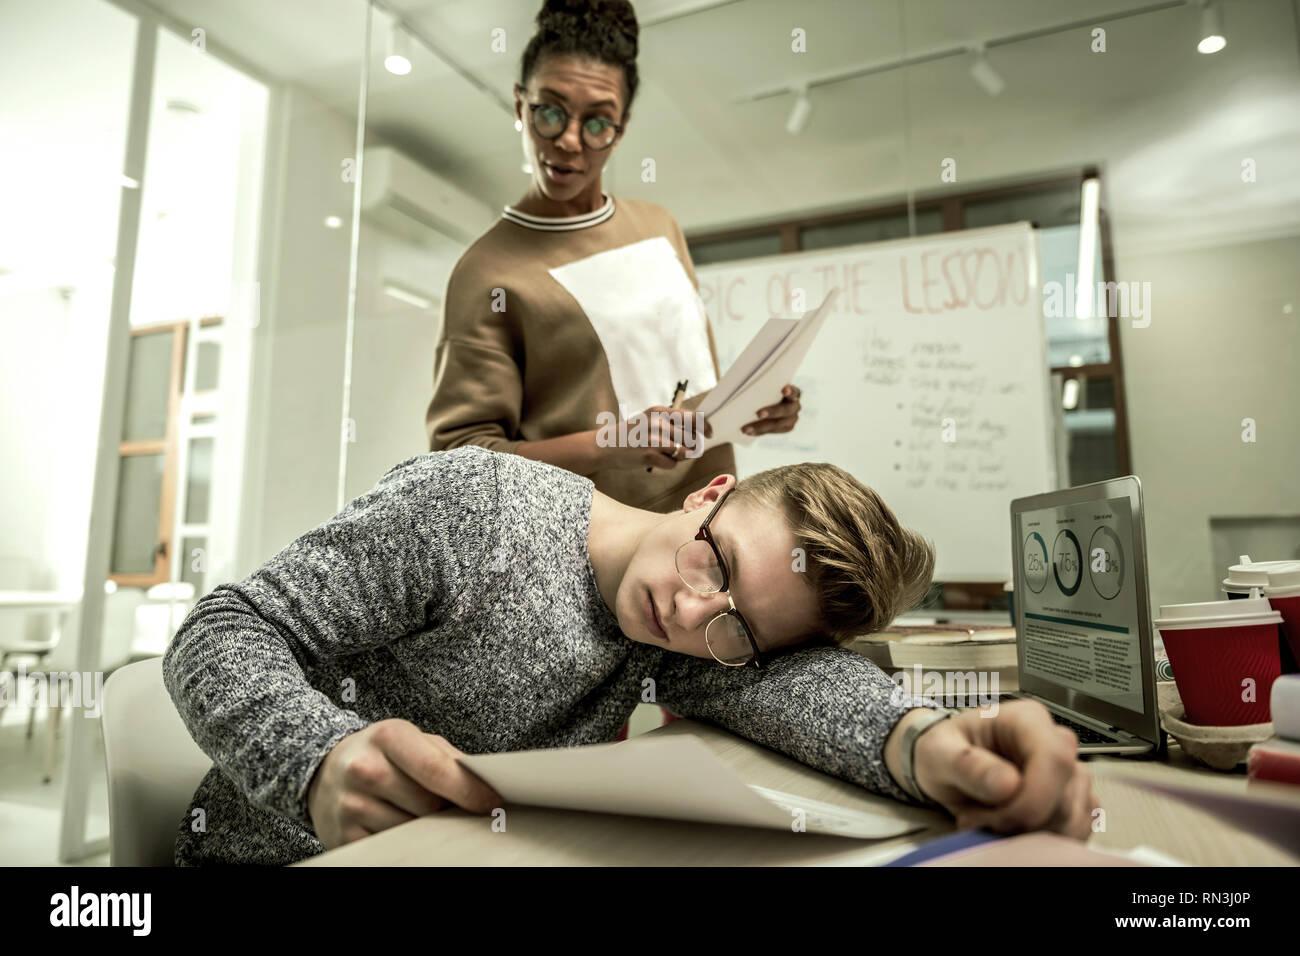 Student pretending not to listen to his teacher standing near him - Stock Image